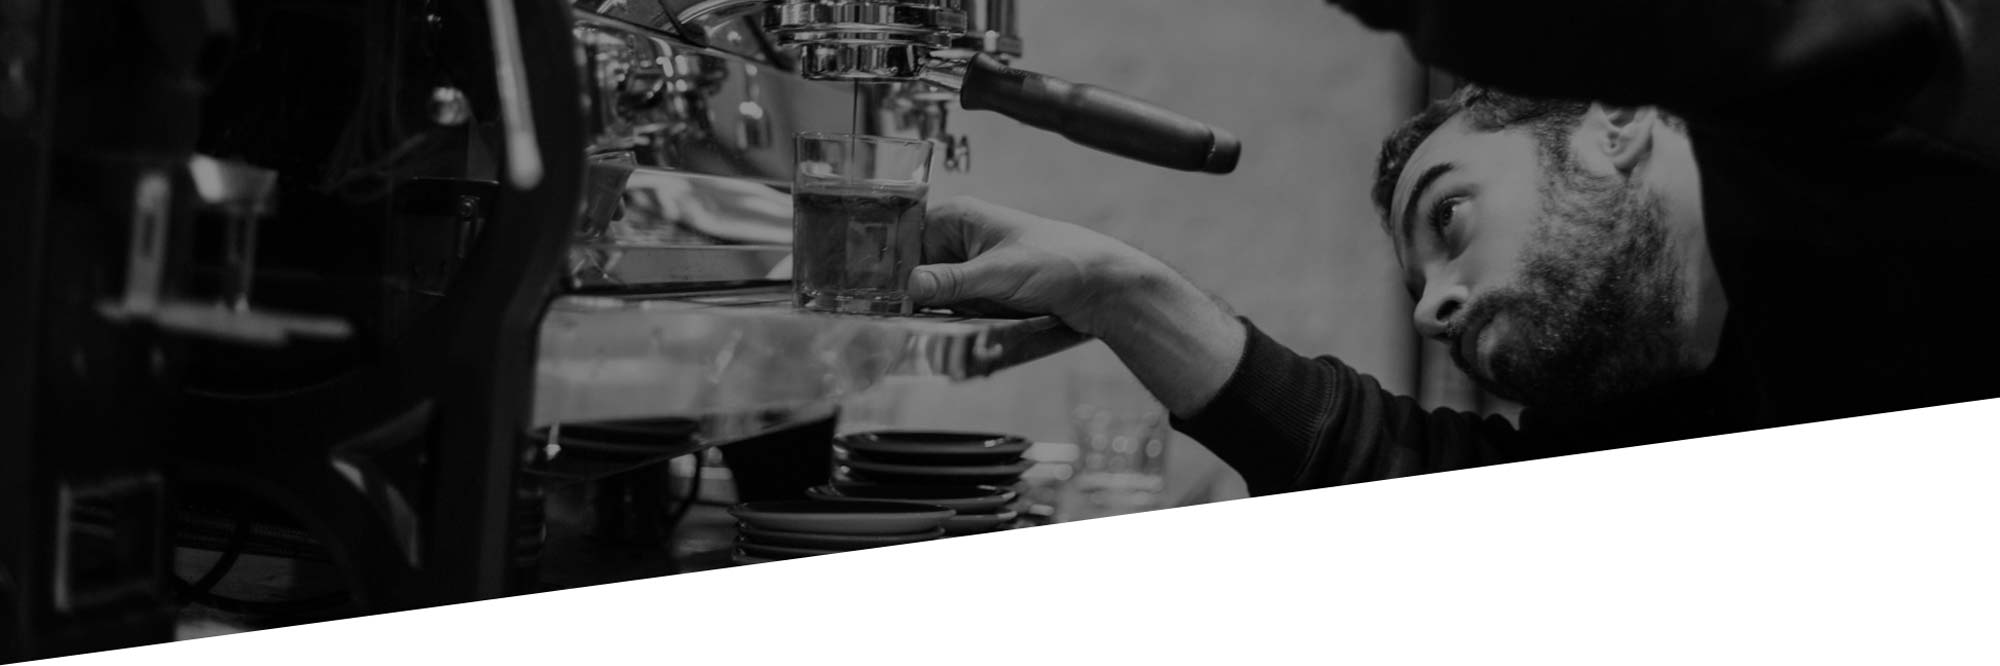 si-caffe-brueckenseite-machine-setting